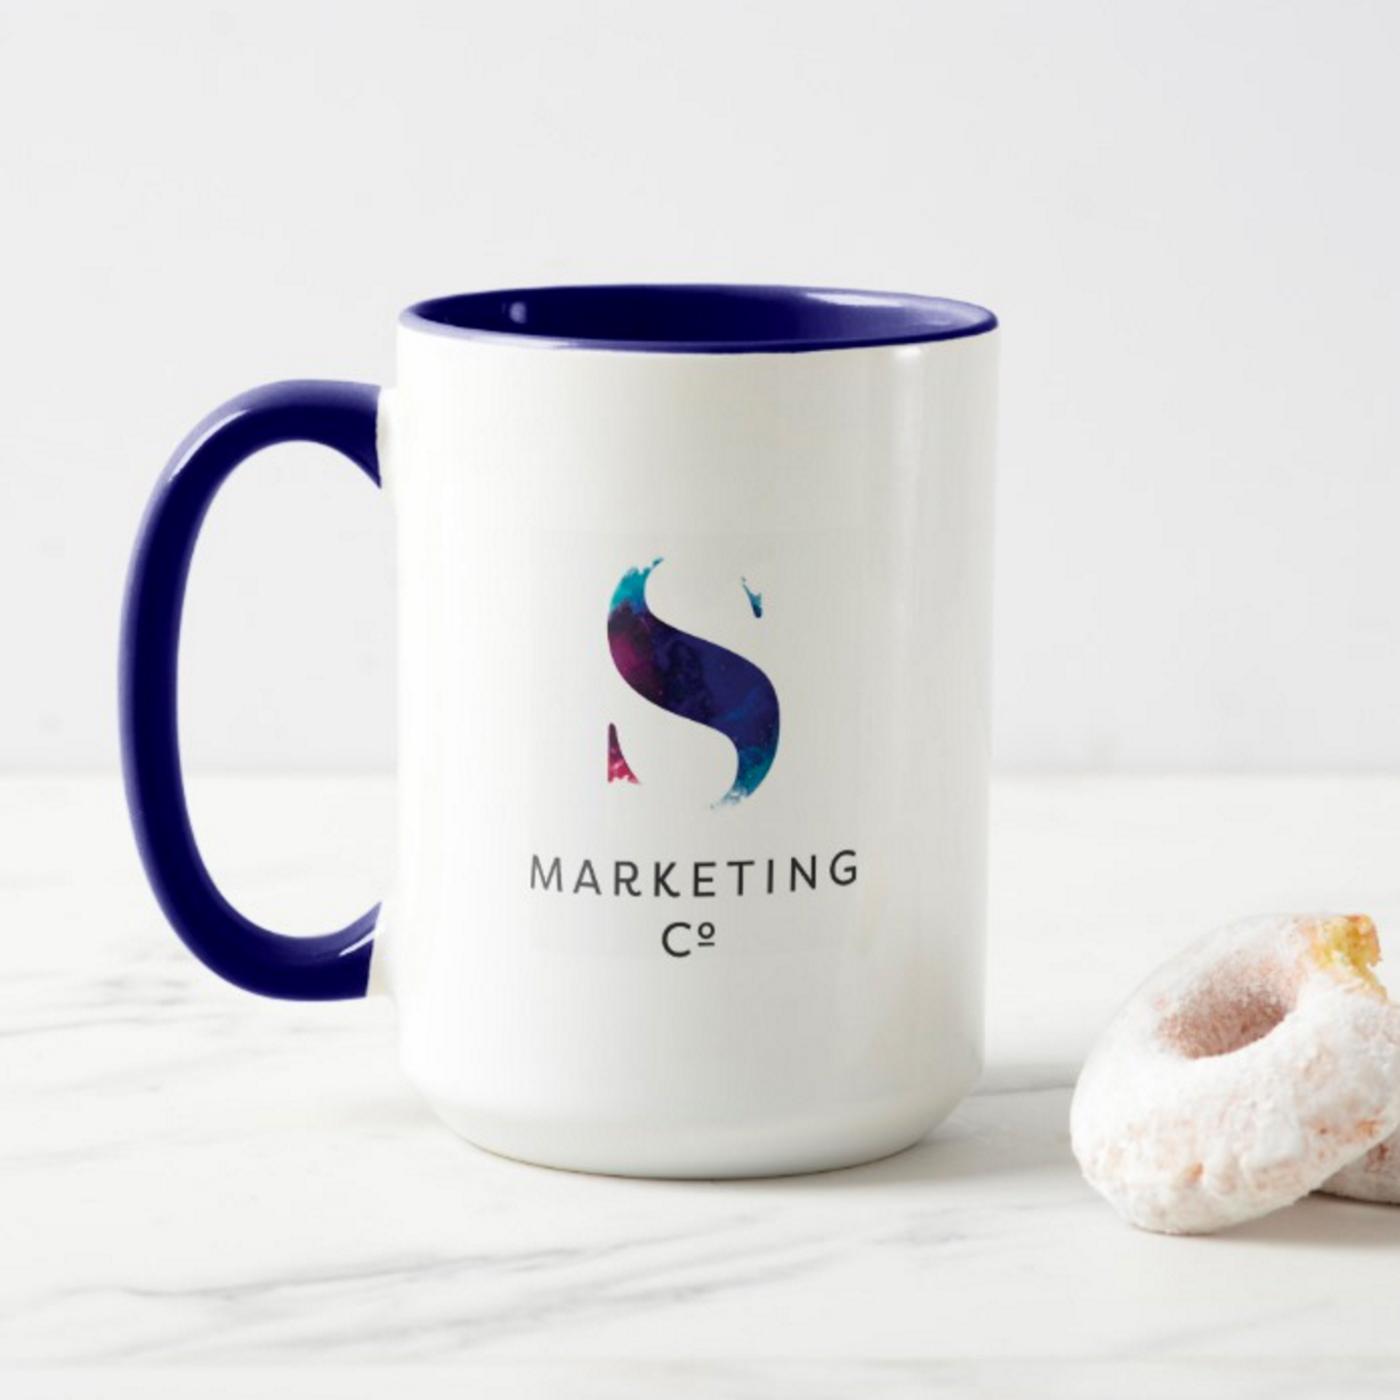 Flipside Creative, Custom Mug Design for S Marketing Co